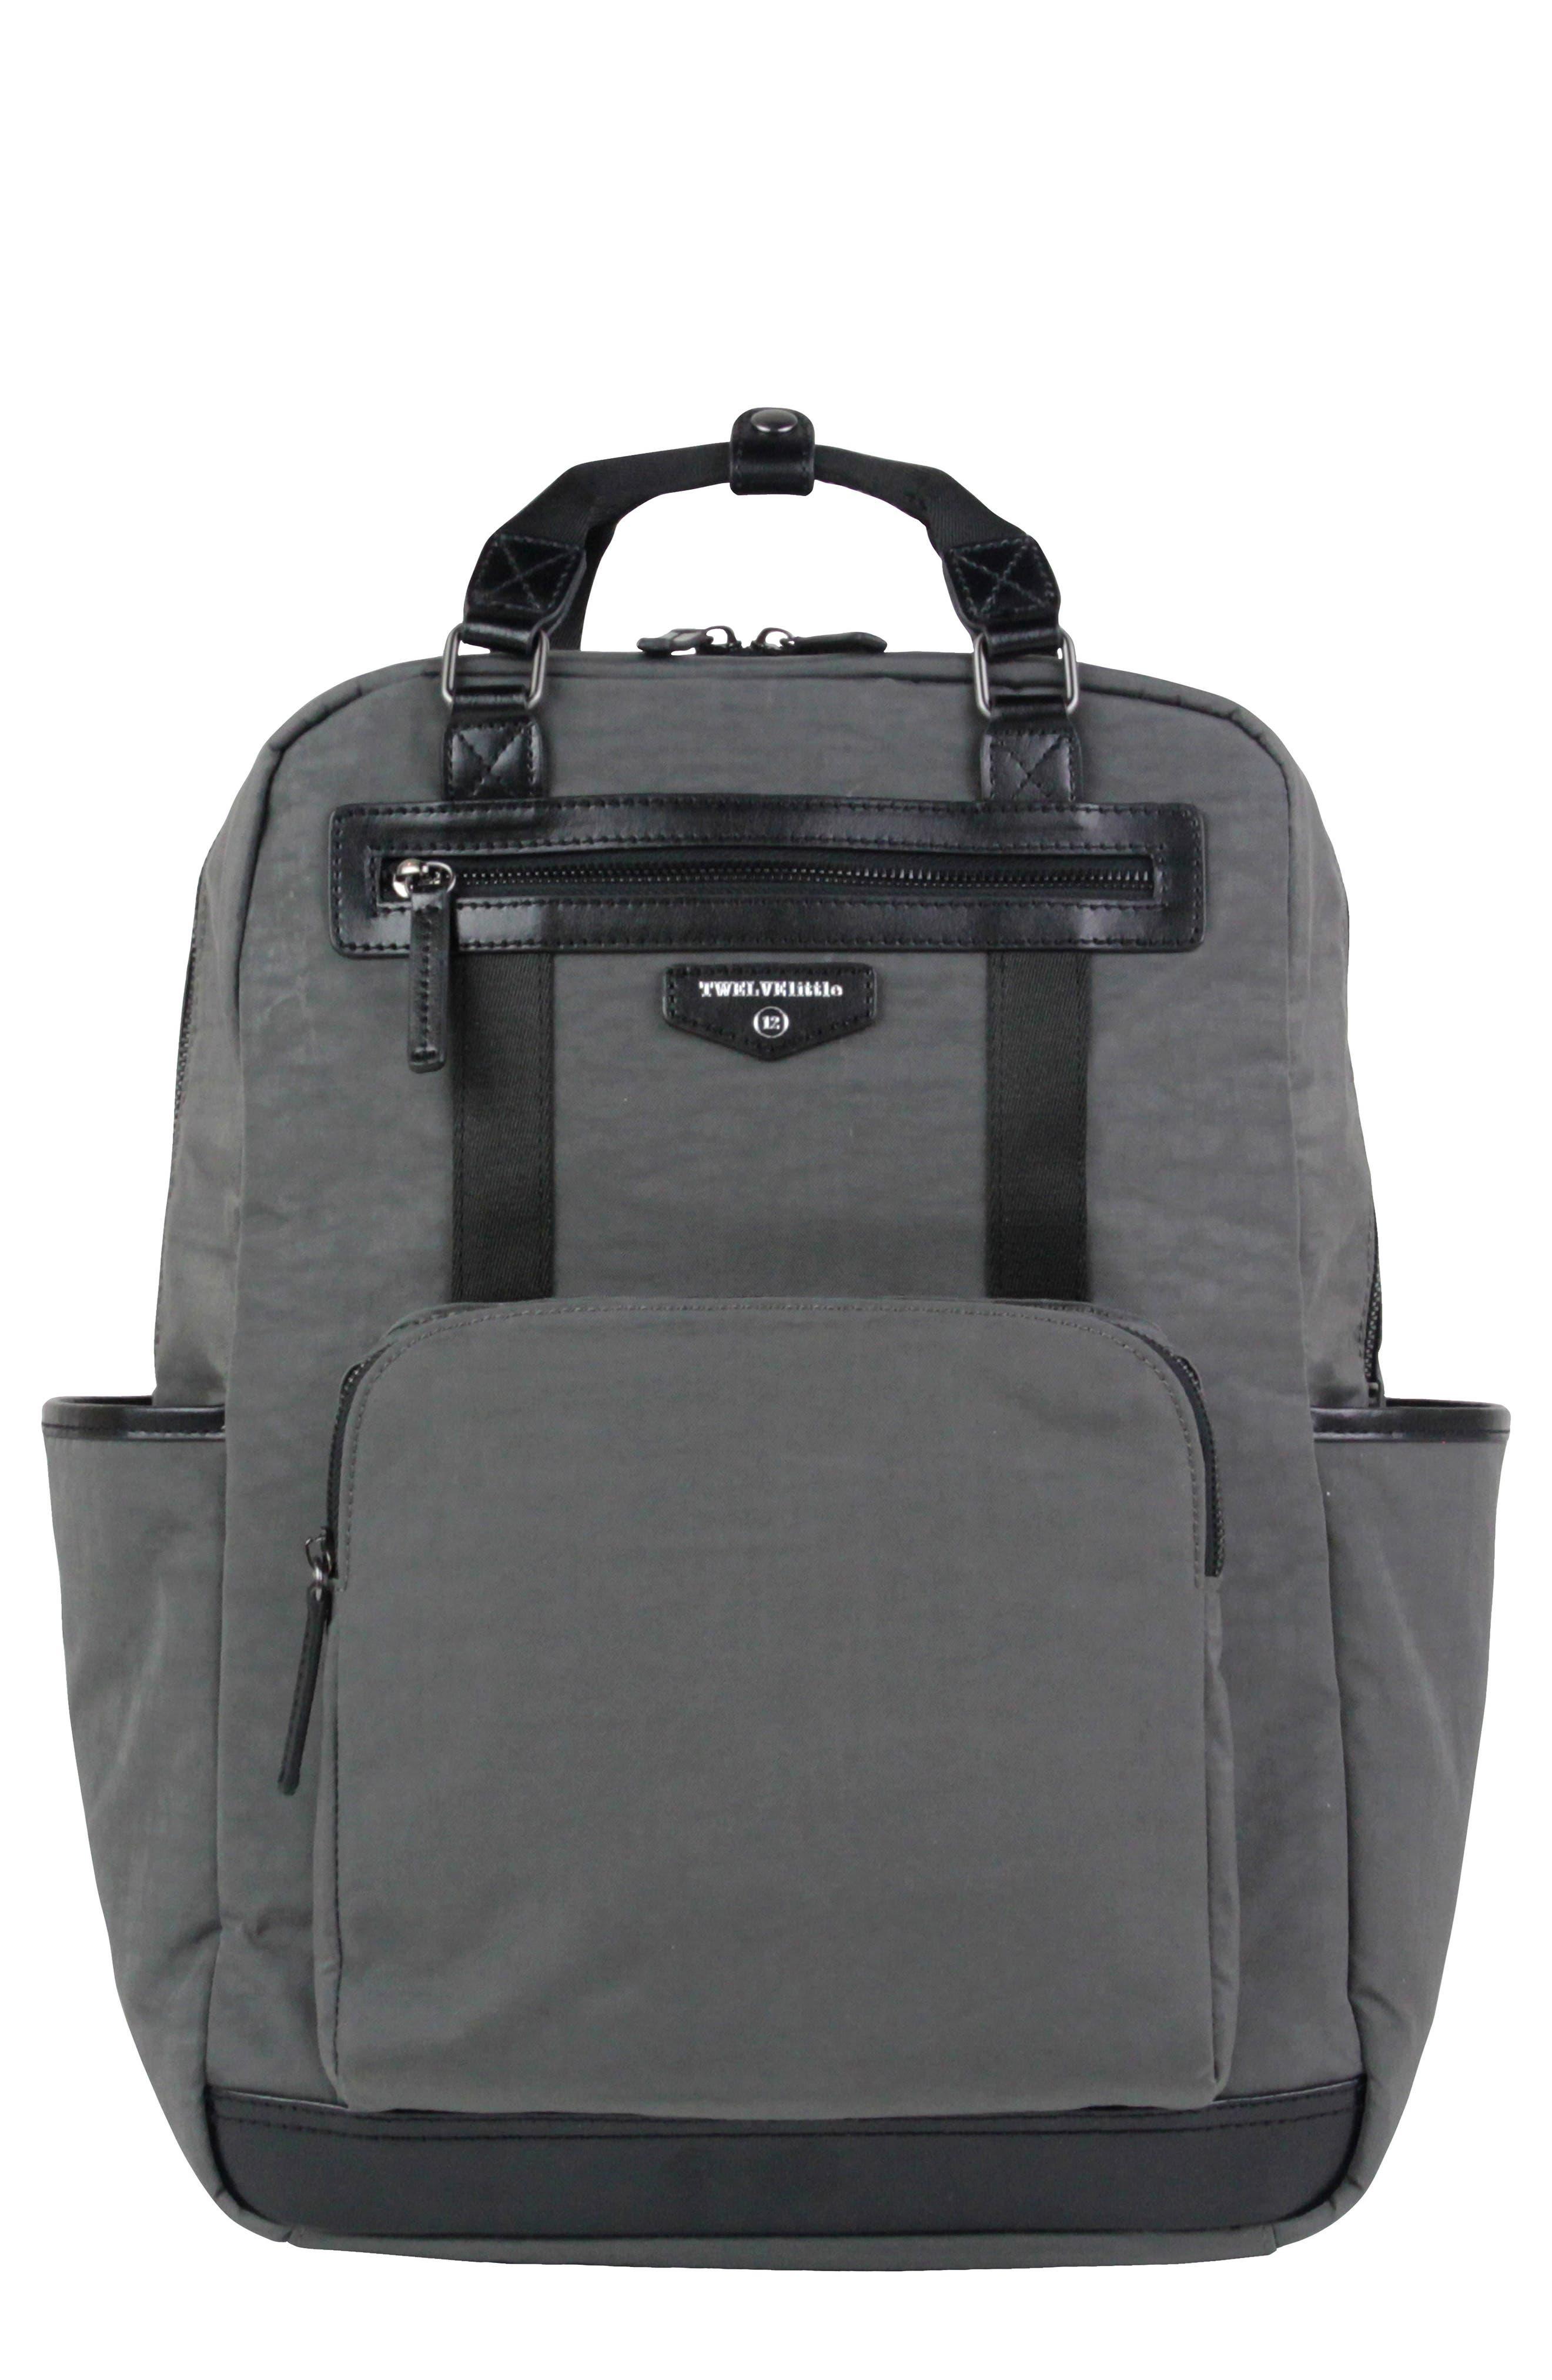 'Courage' Unisex Backpack Diaper Bag,                             Main thumbnail 1, color,                             DARK GREY